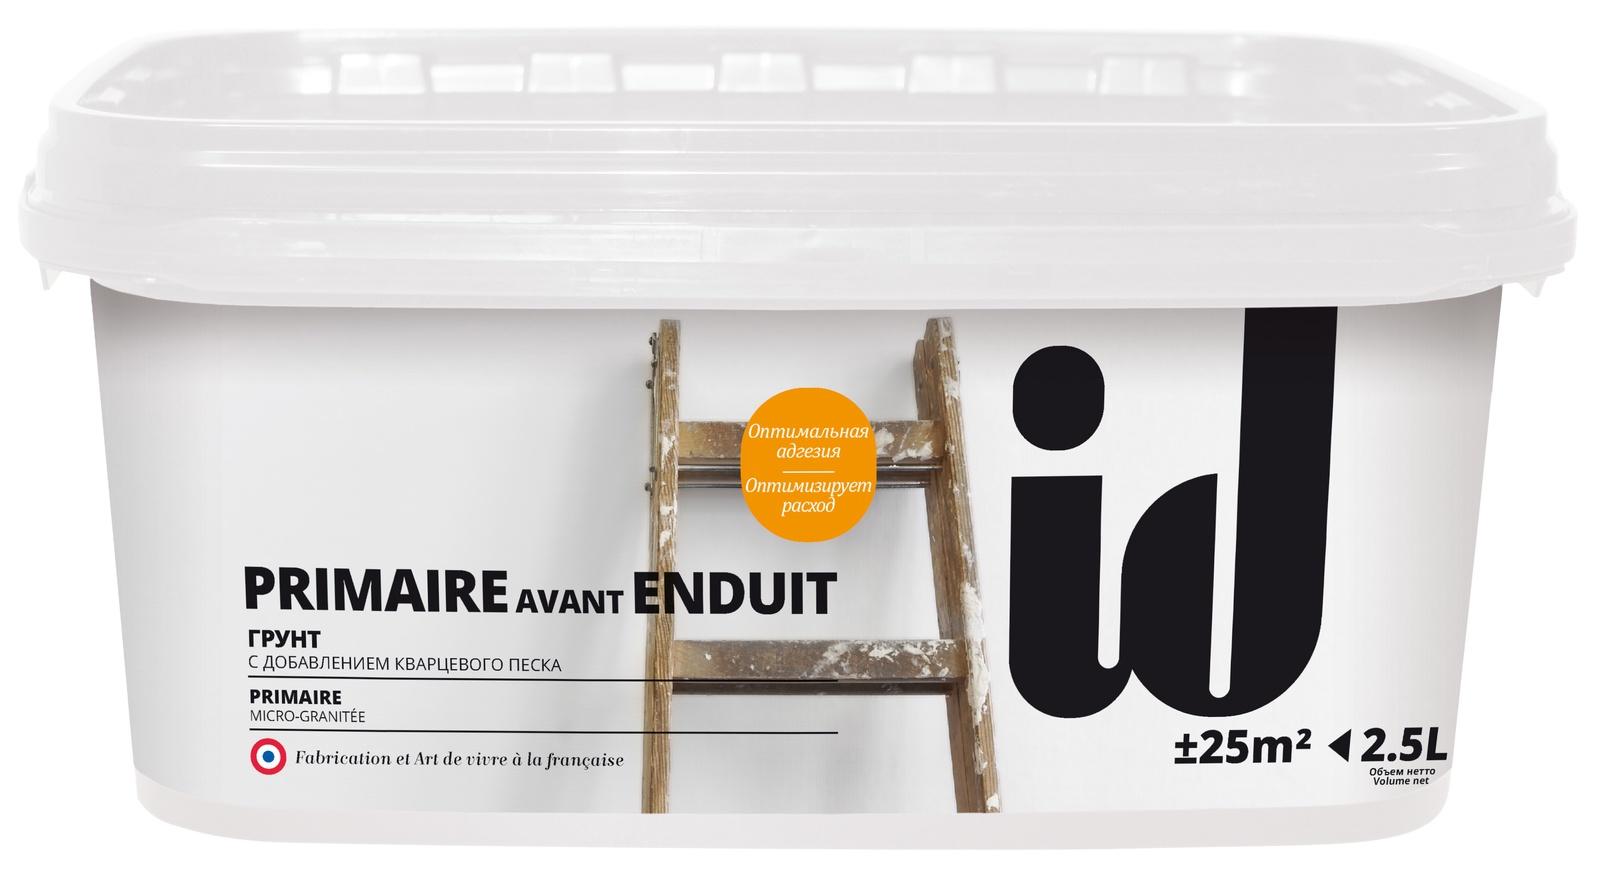 Грунтовка Initiatives Decoration с кварцевым песком Primaire Avant Enduit 2,5л, ID0017 Initiatives Decoration